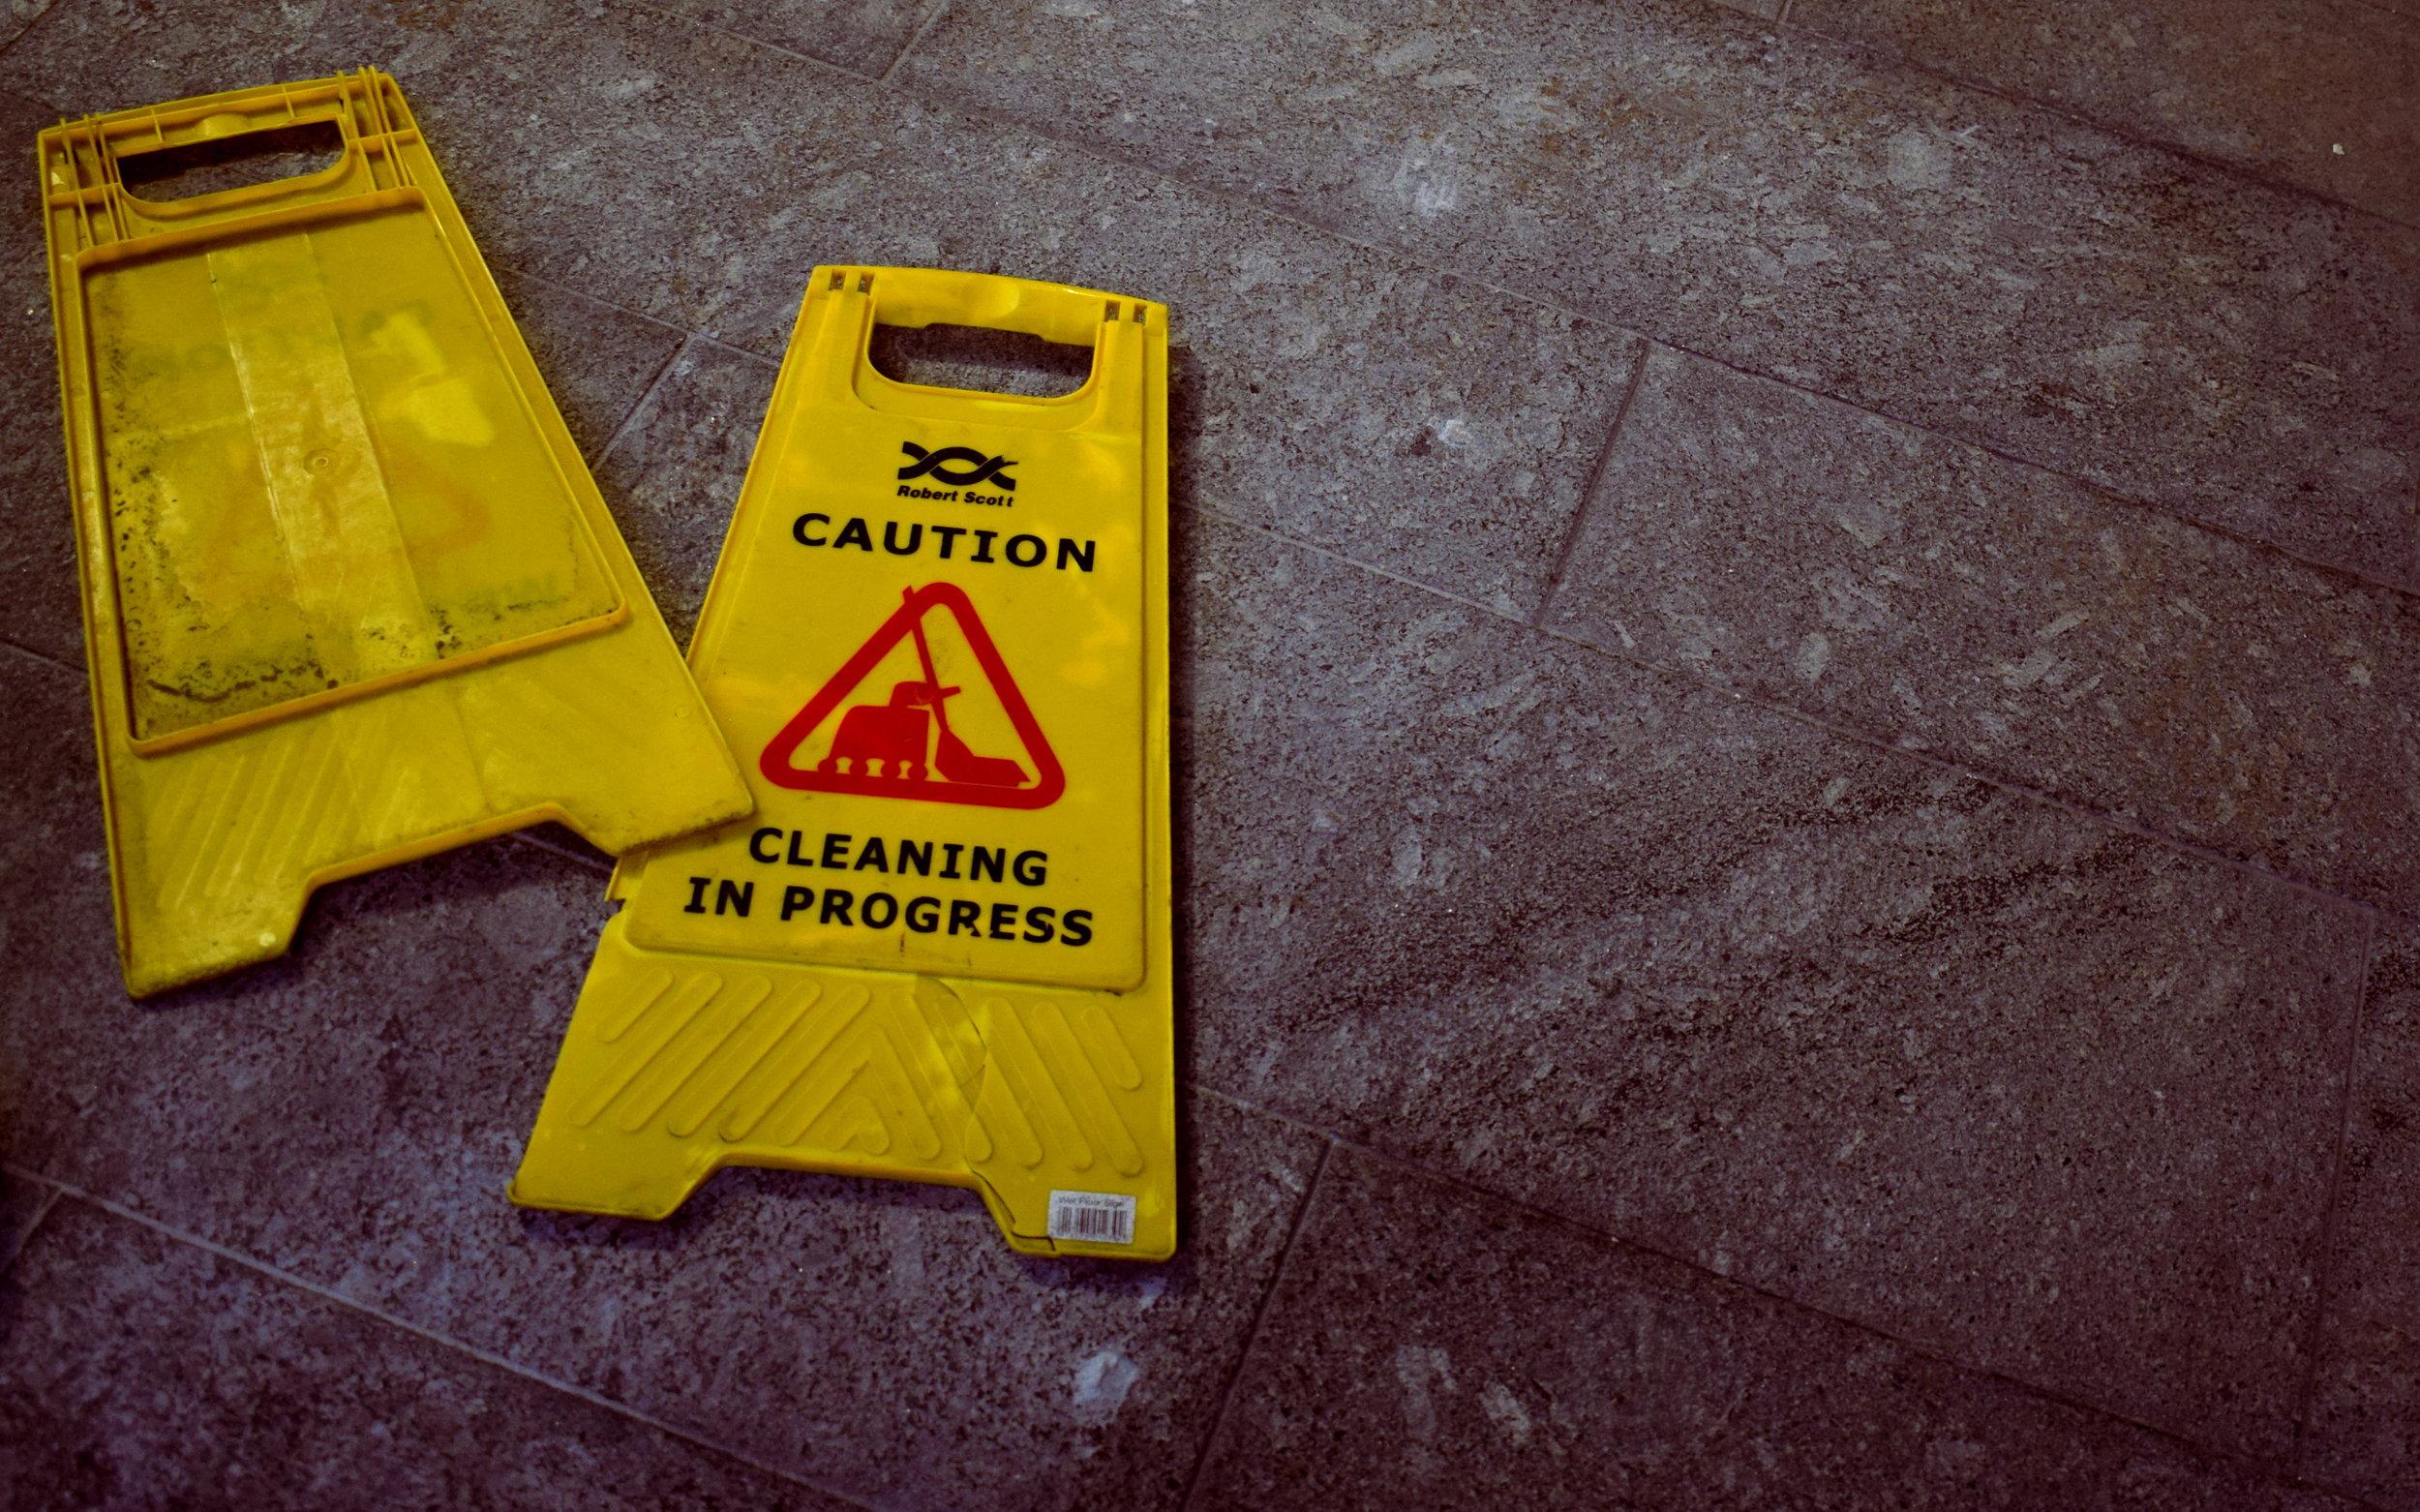 Premises Liability -